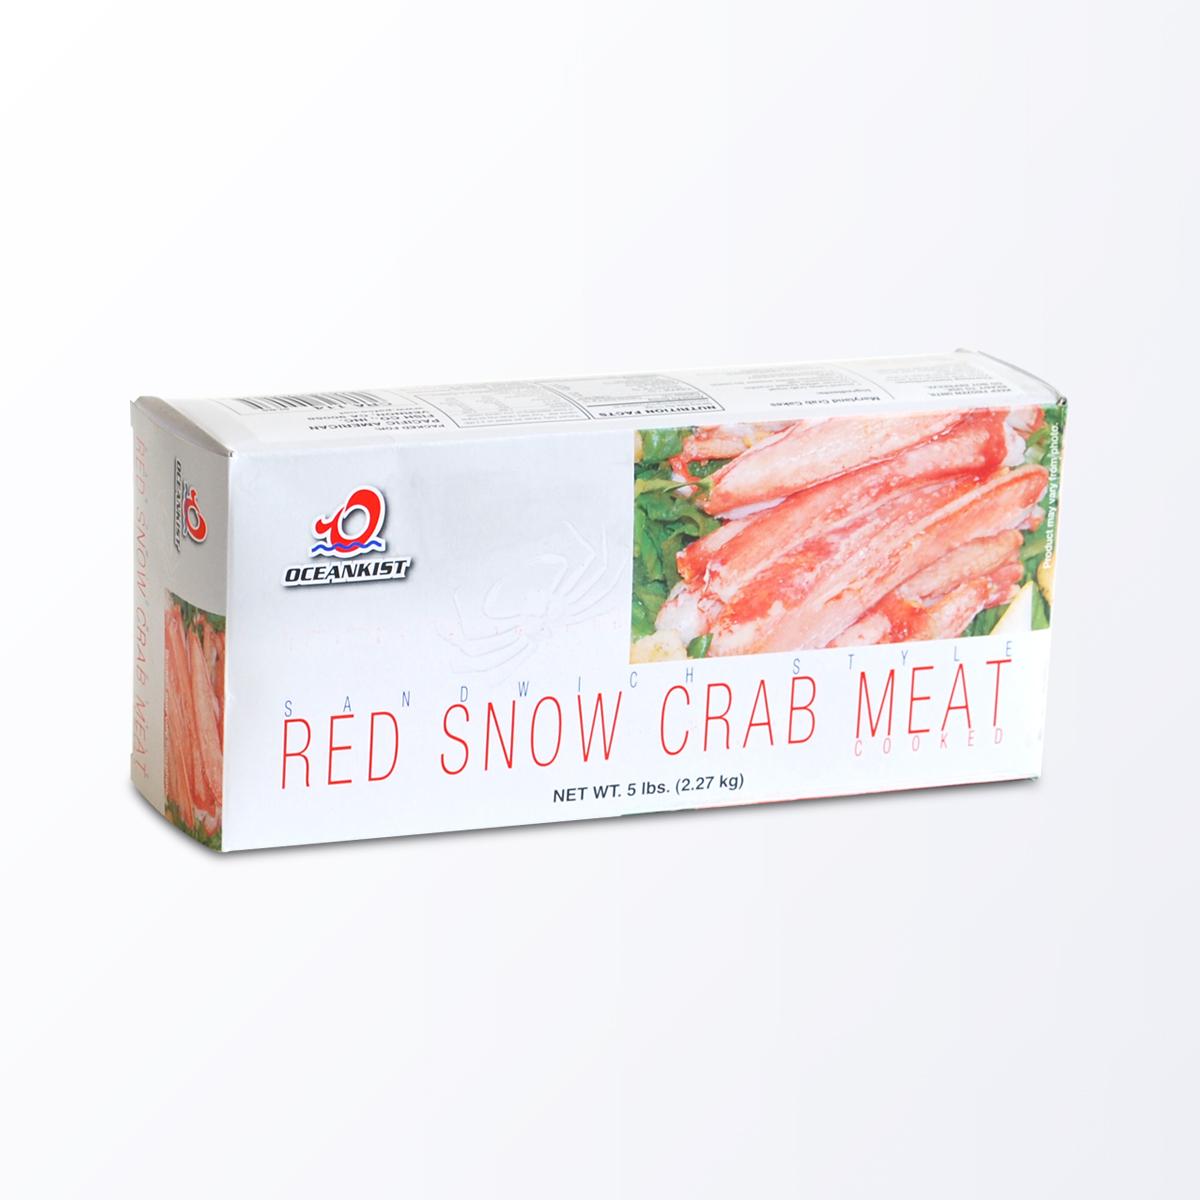 CRA114-Crab-Red-Snow-Meat.jpg